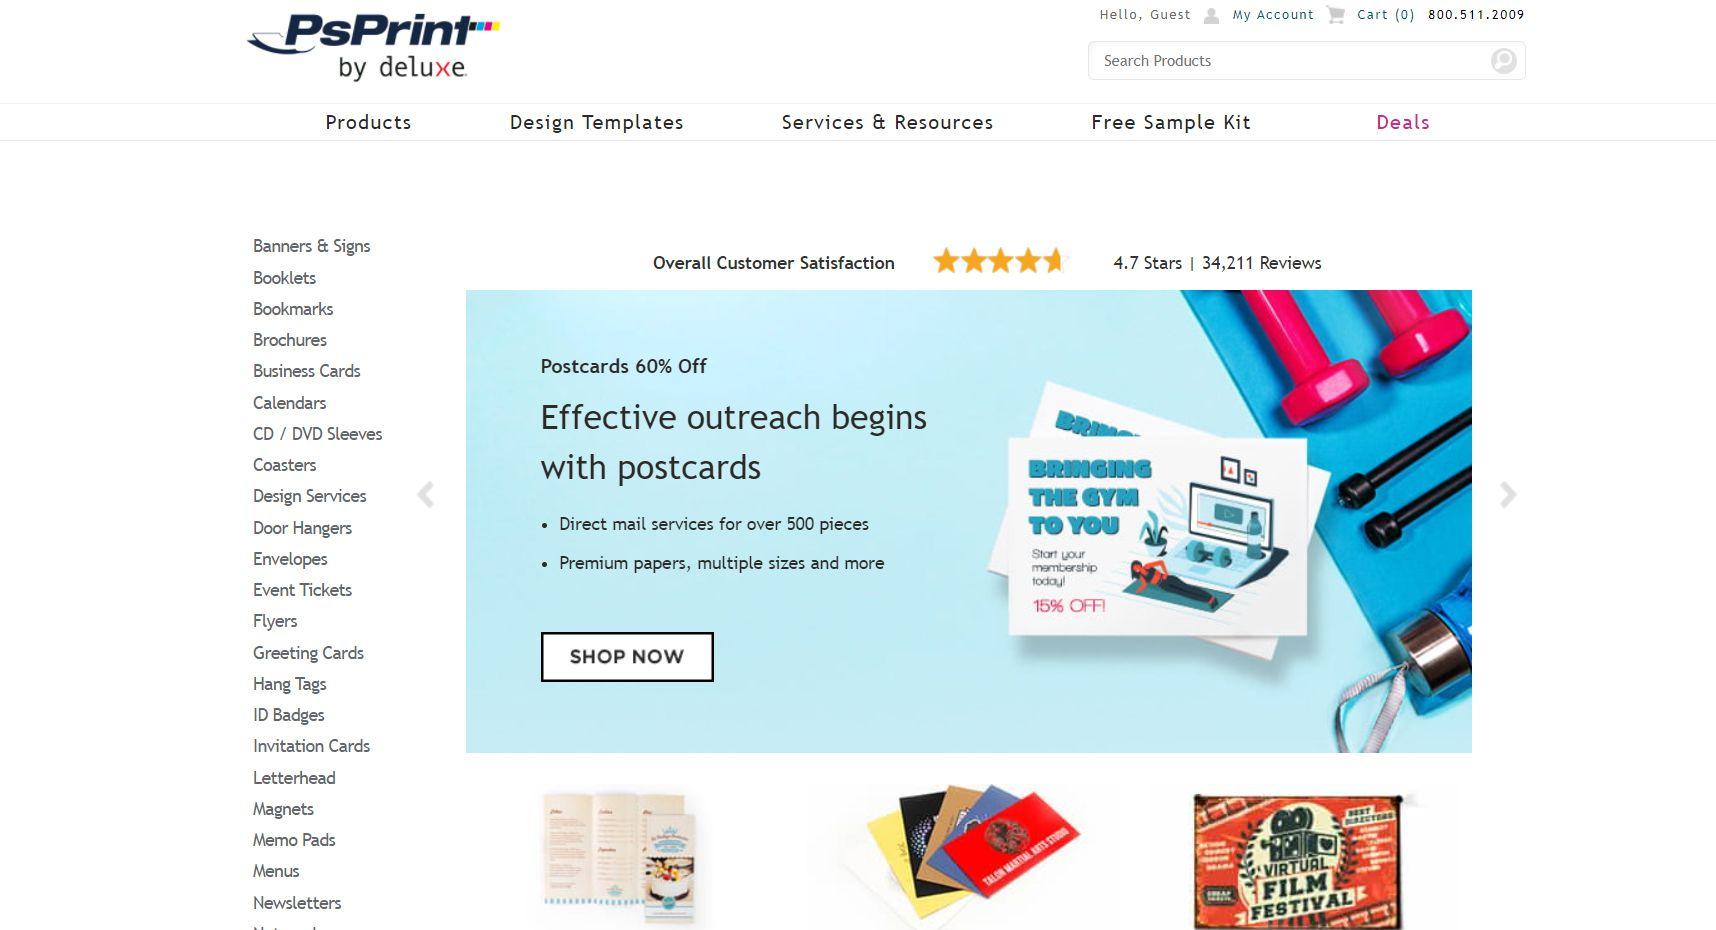 The PsPrint homepage